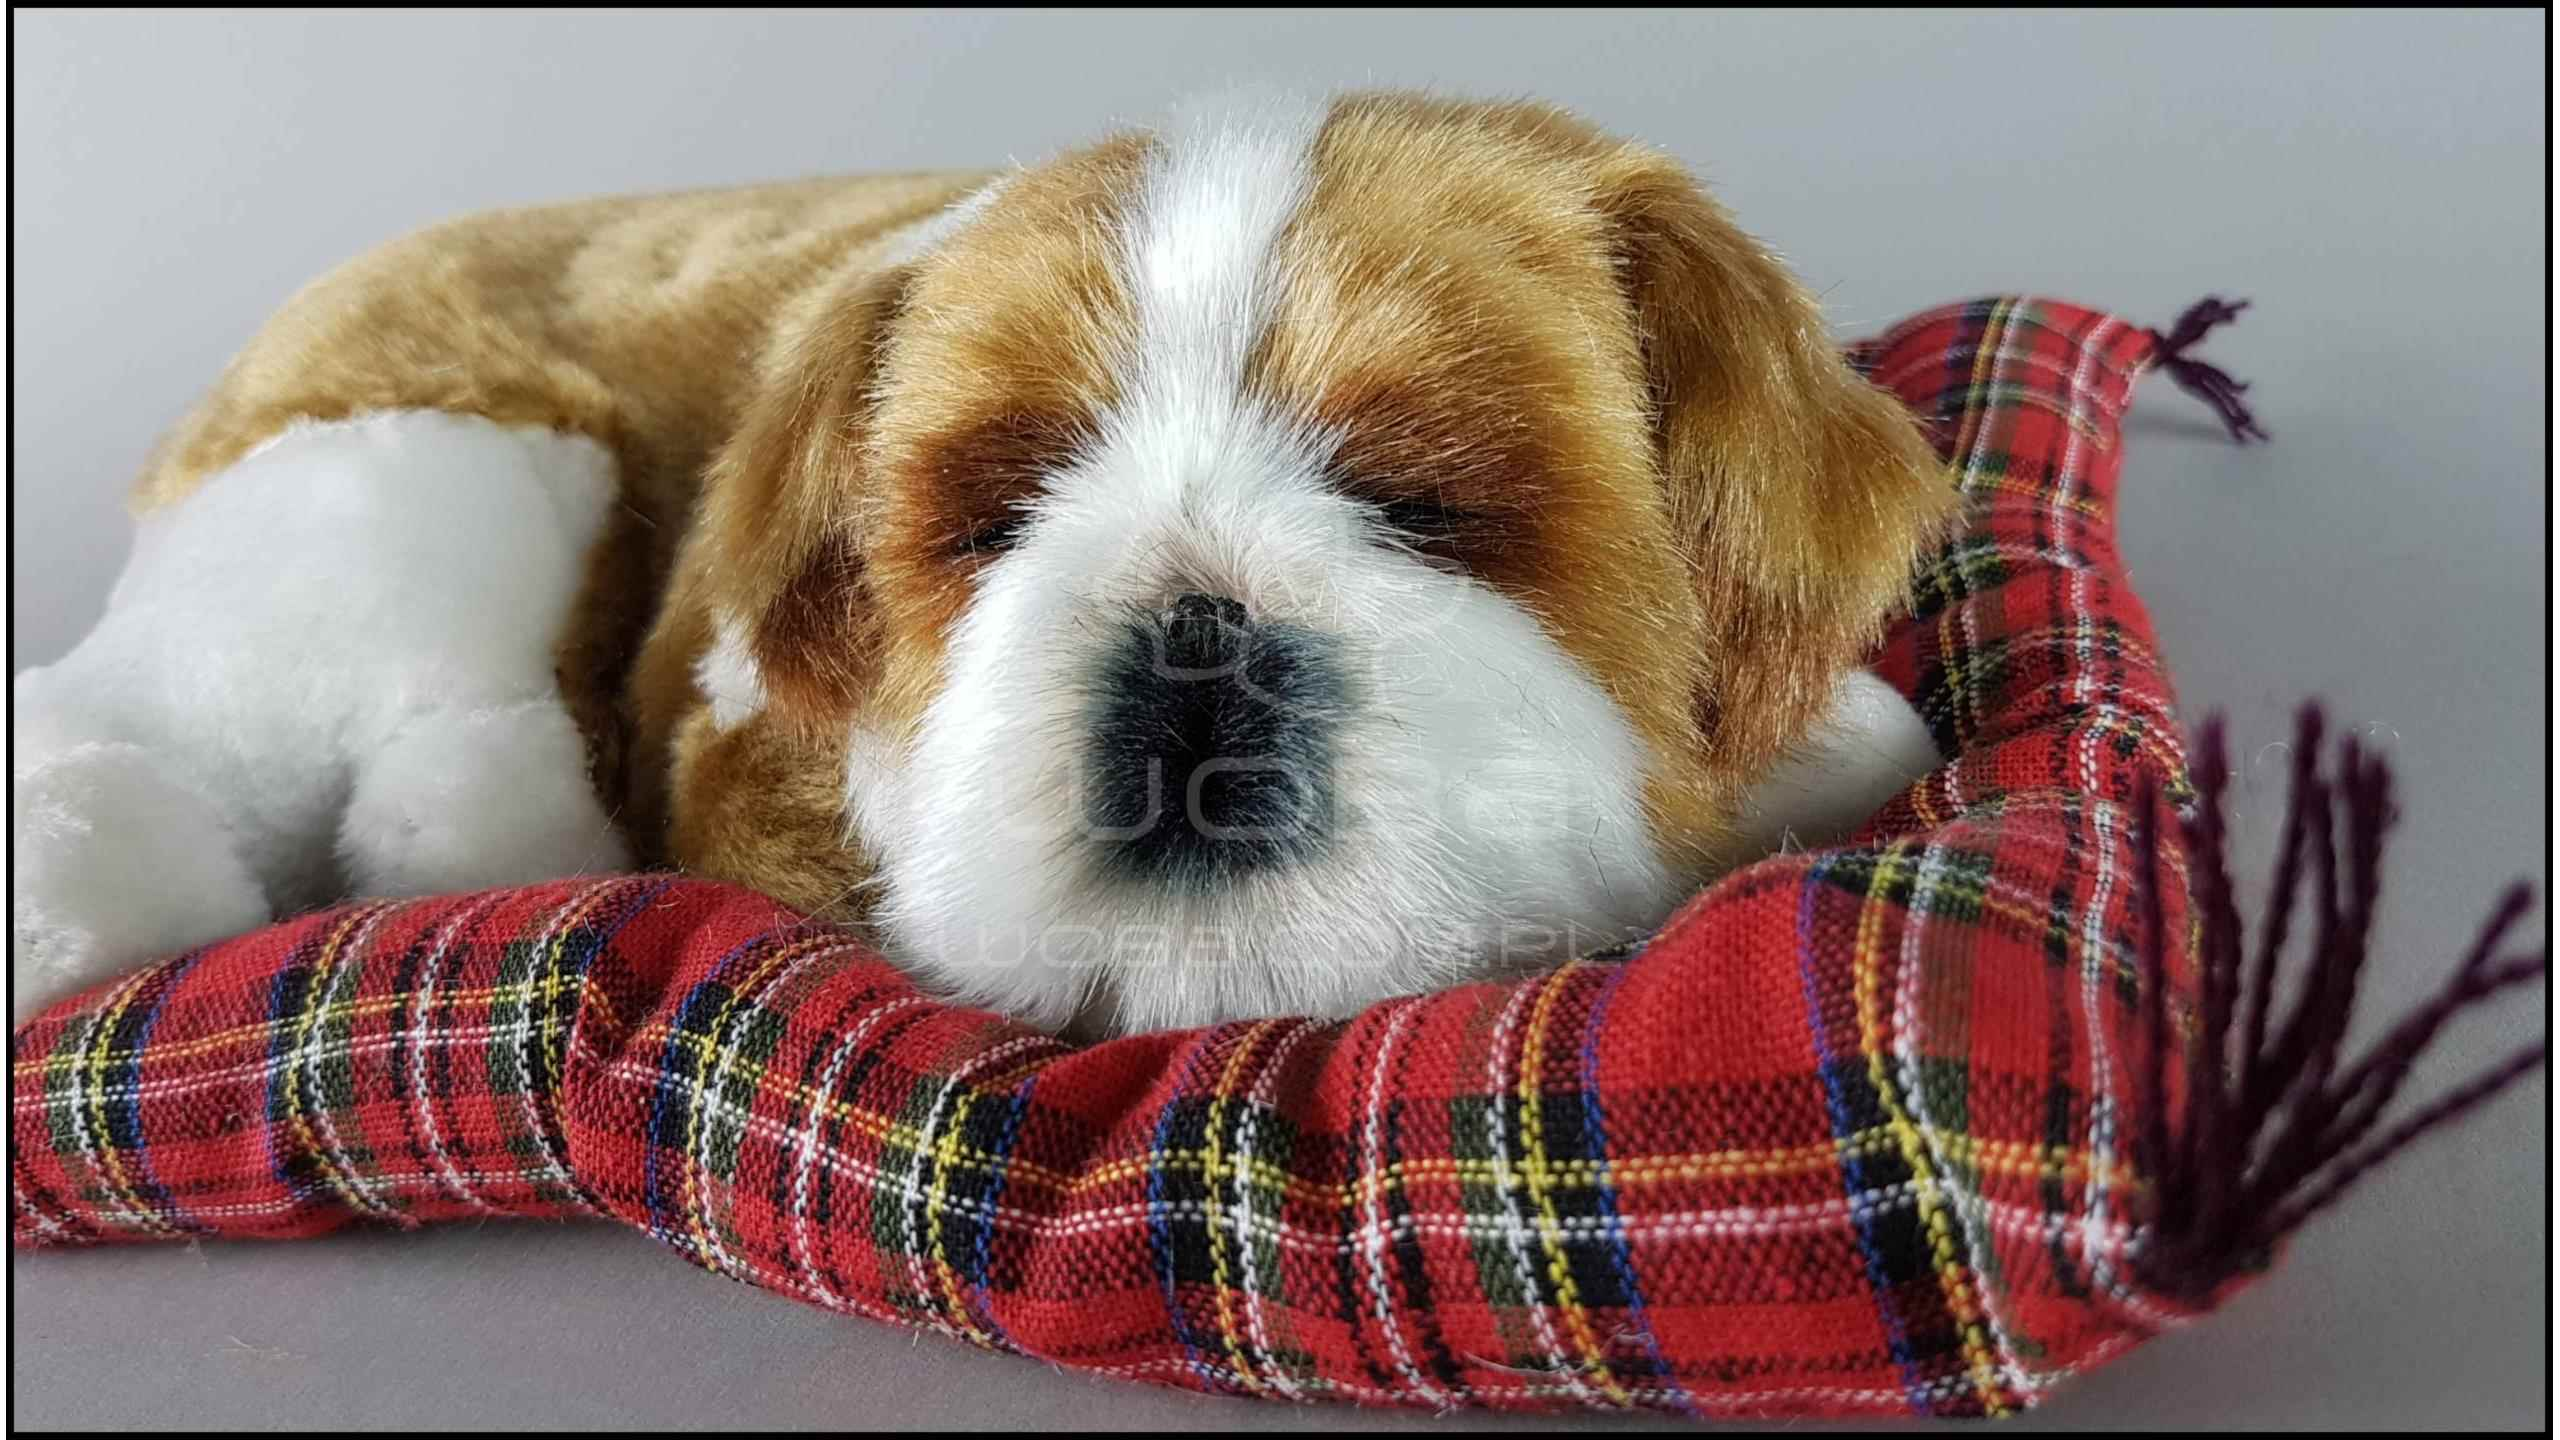 dog cocker spaniel on a pillow